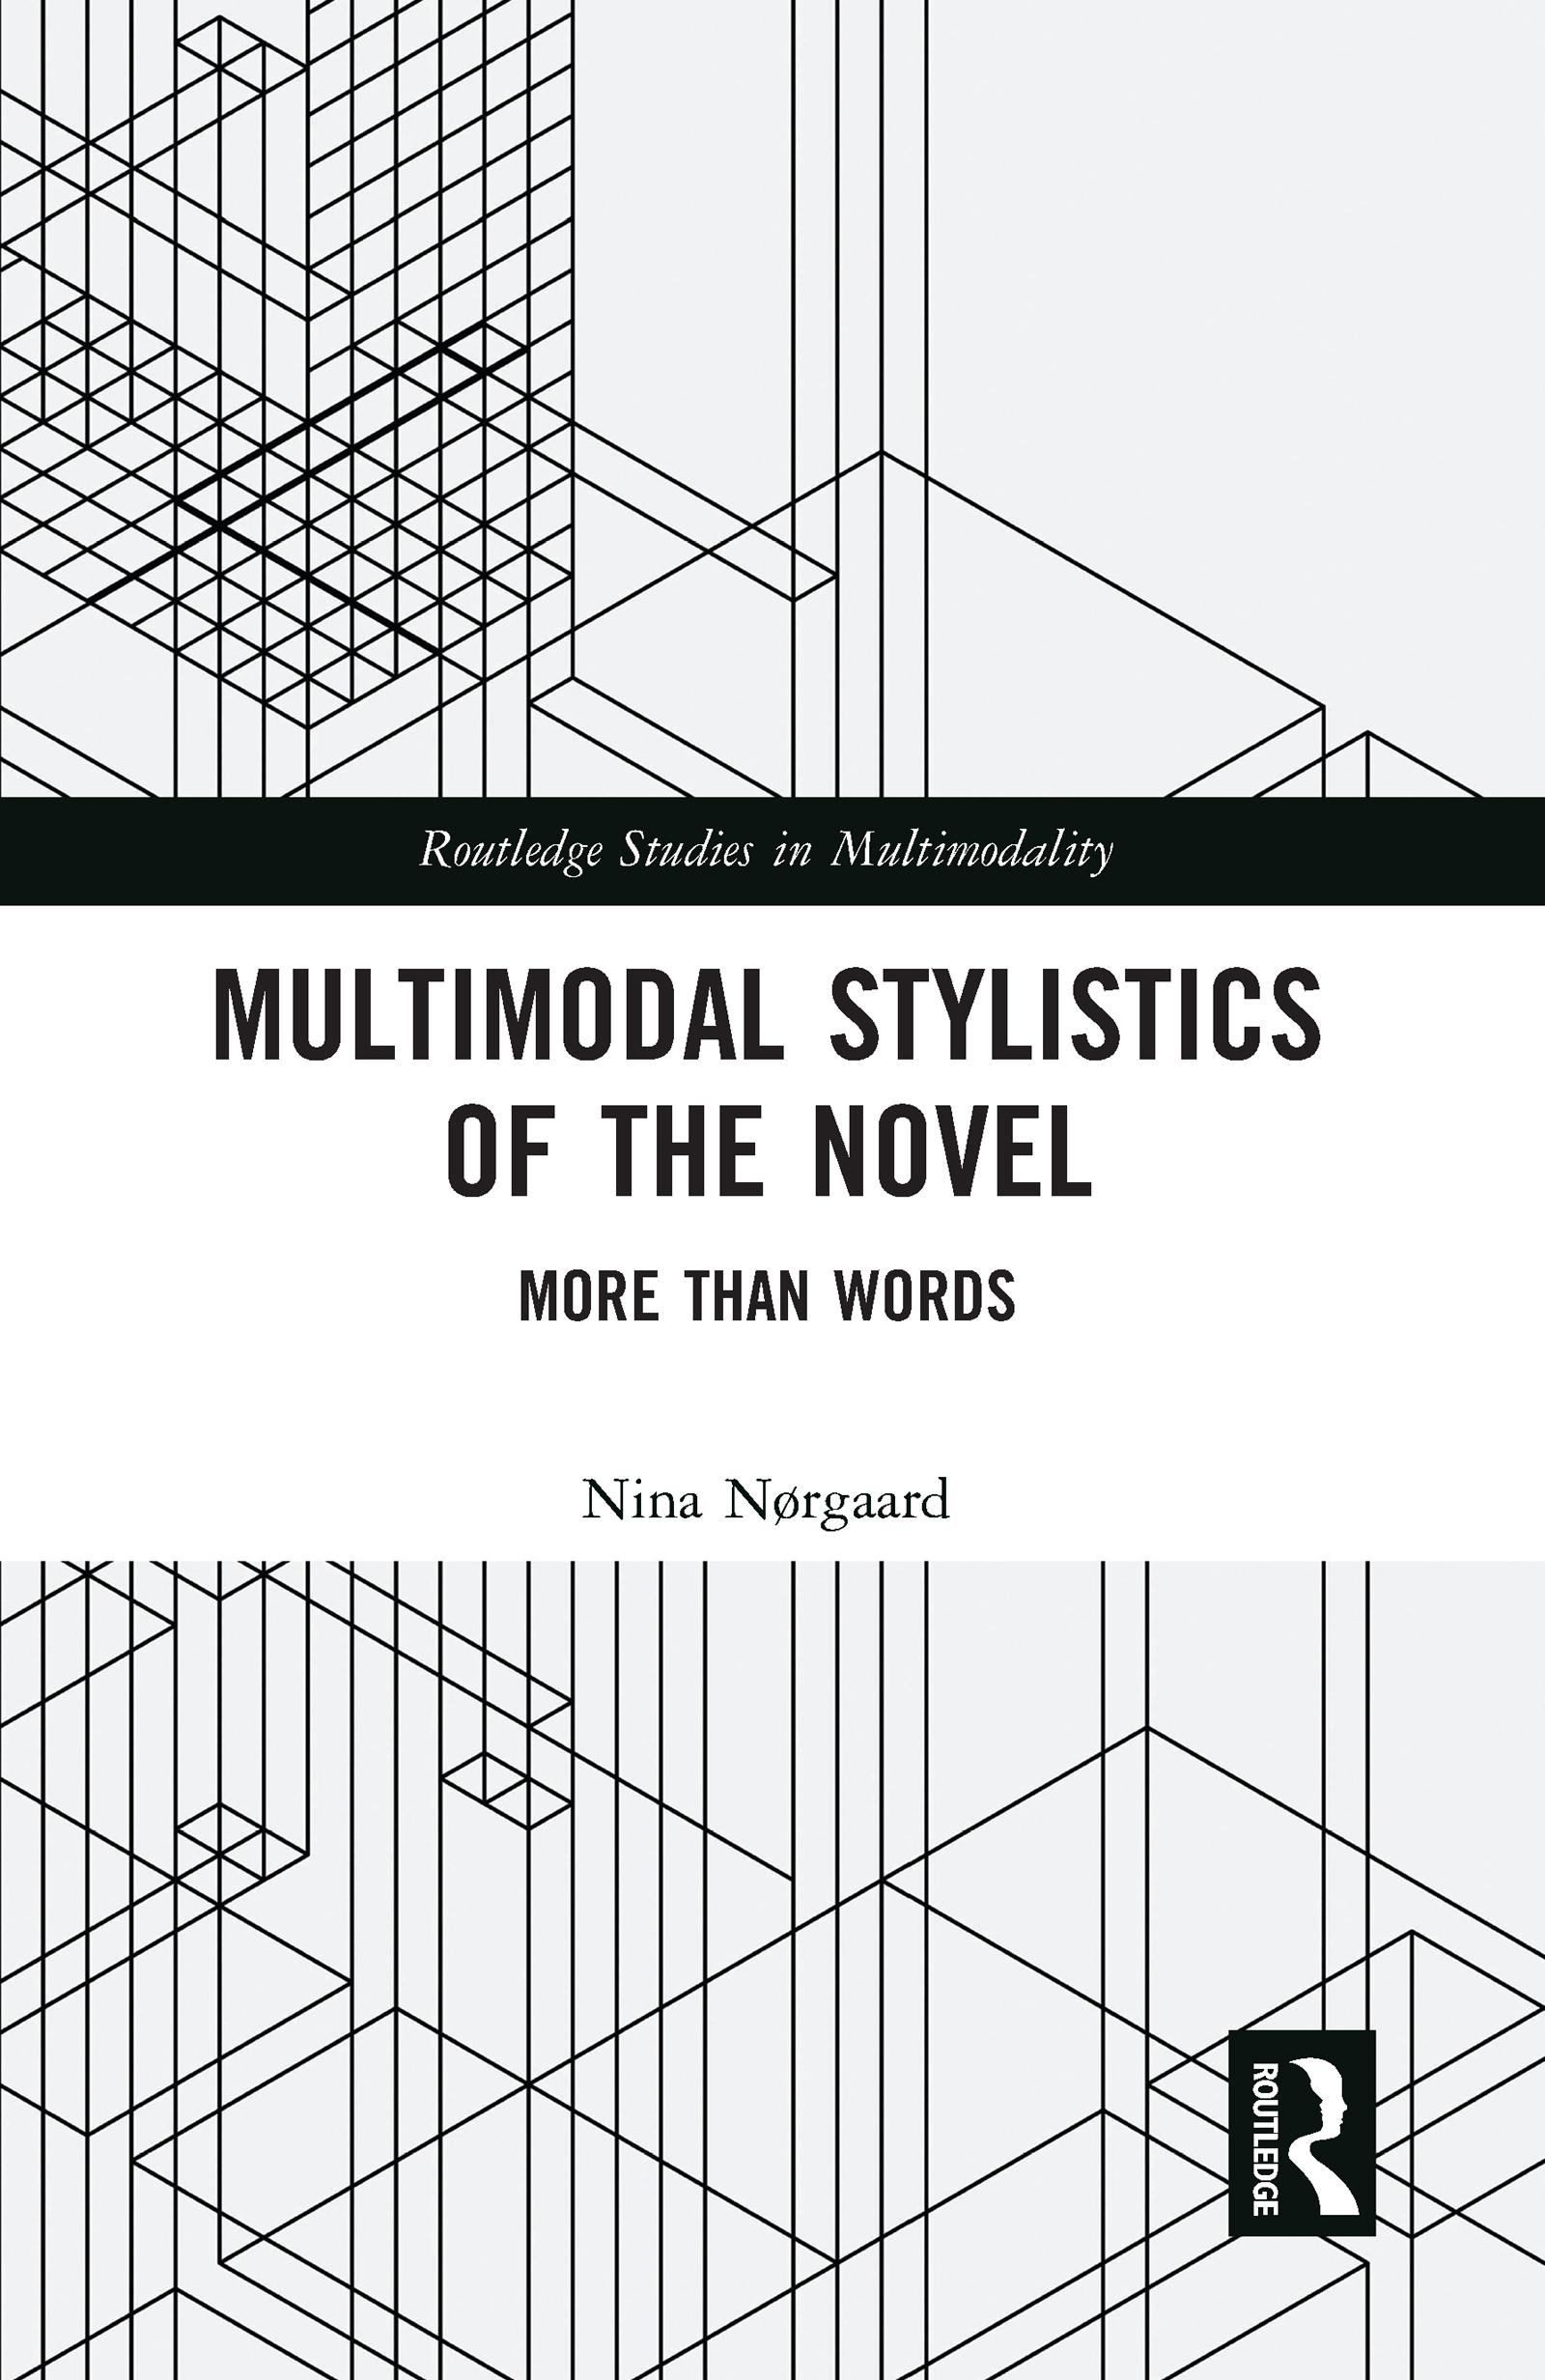 Multimodal Stylistics of the Novel